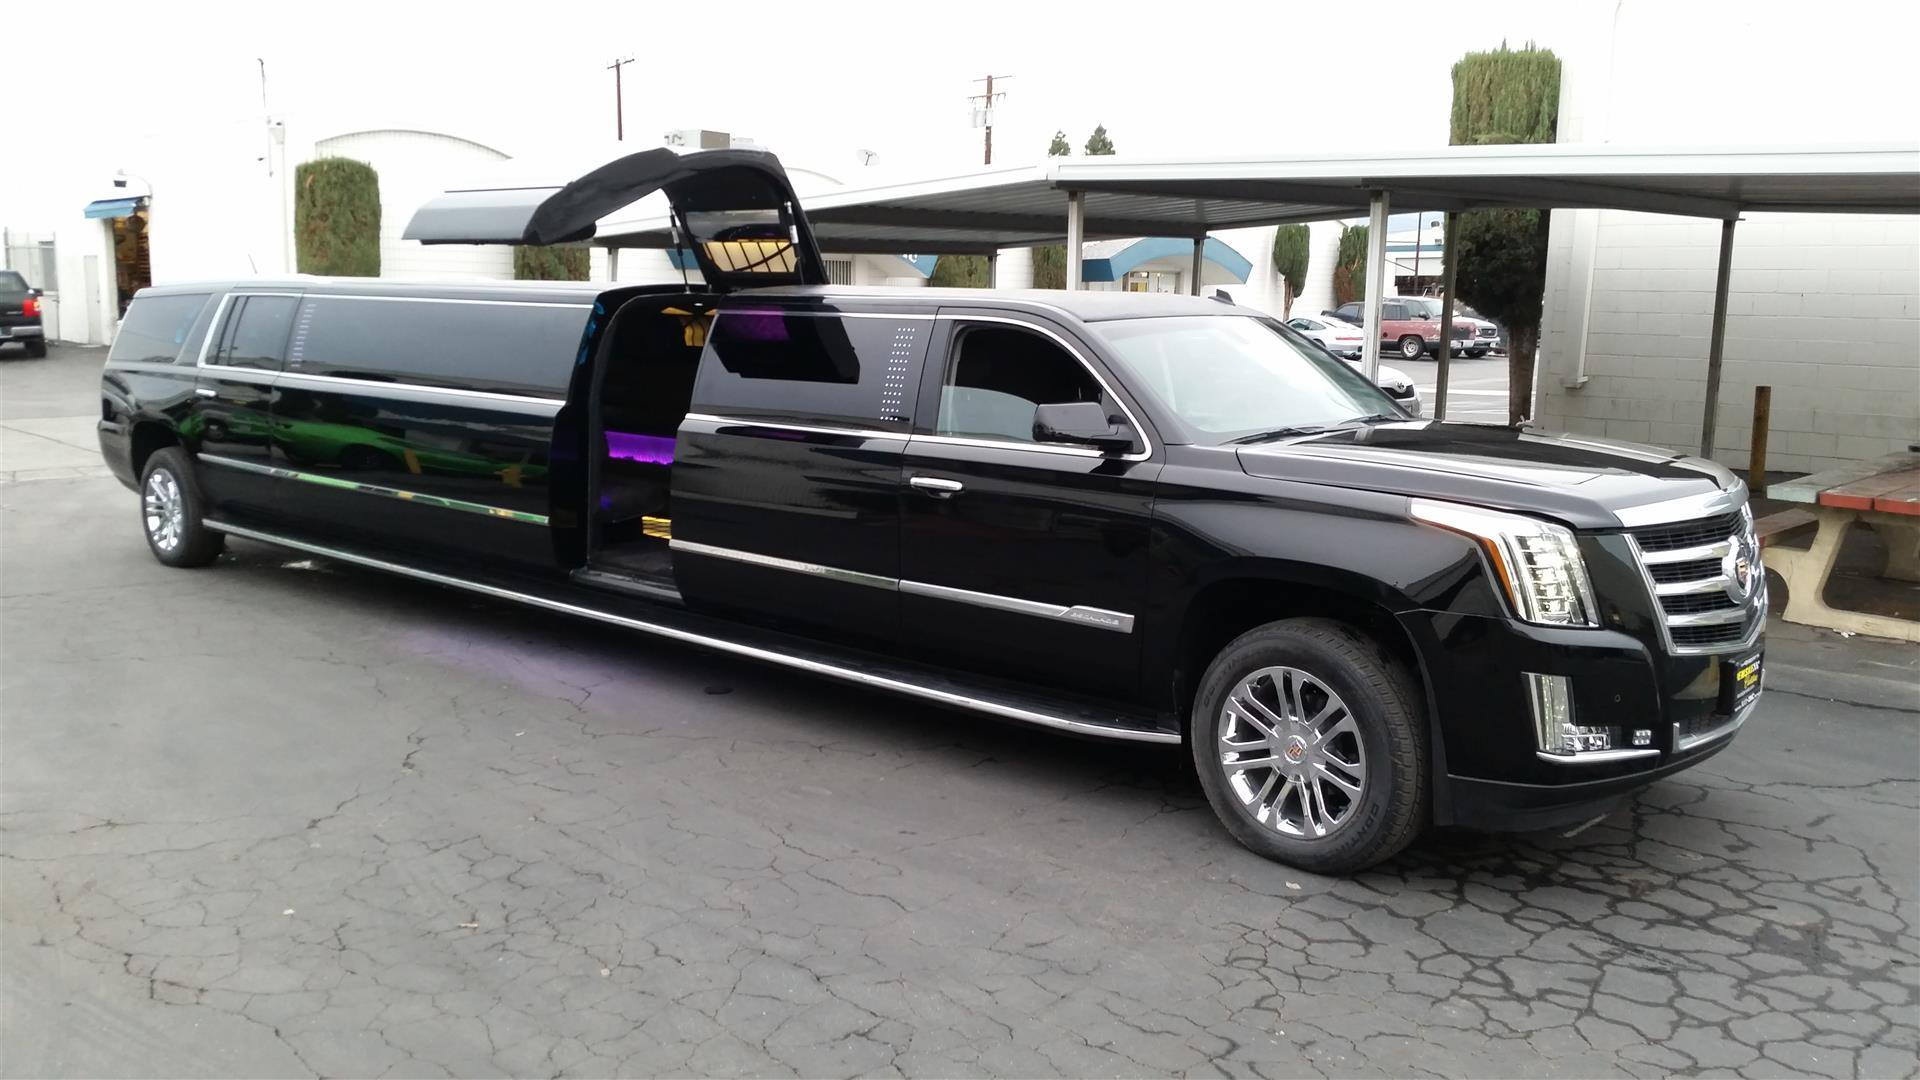 Peachy Cadillac Escalade On Cadillac Escalade Limousine Wiring Diagram Wiring Digital Resources Bemuashebarightsorg